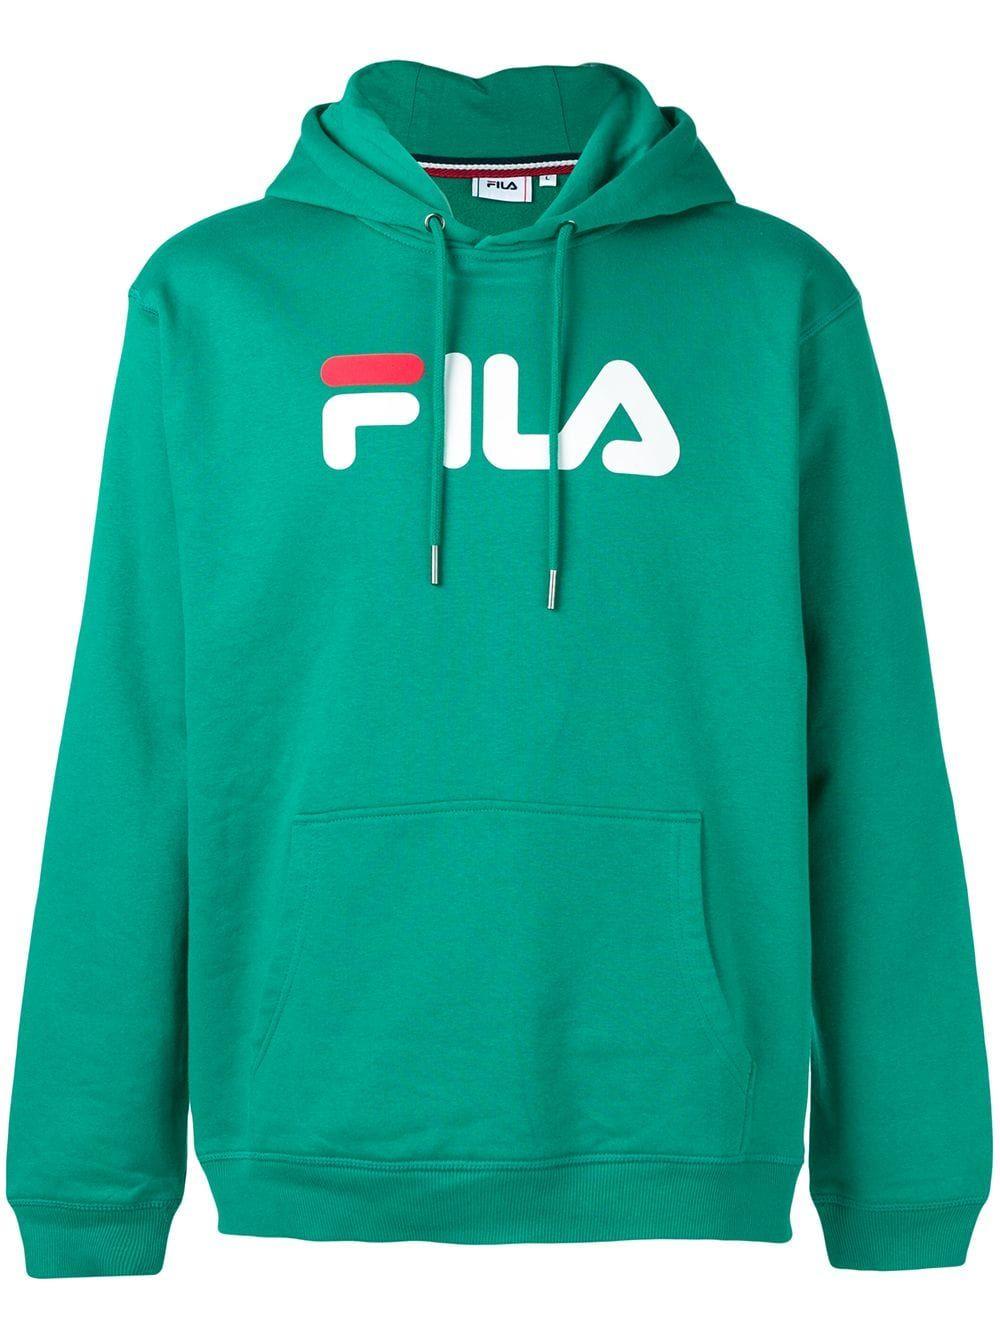 op groothandel delicate kleuren vrouwen FILA FILA LOGO PRINT HOODIE - GREEN. #fila #cloth   Fila in ...